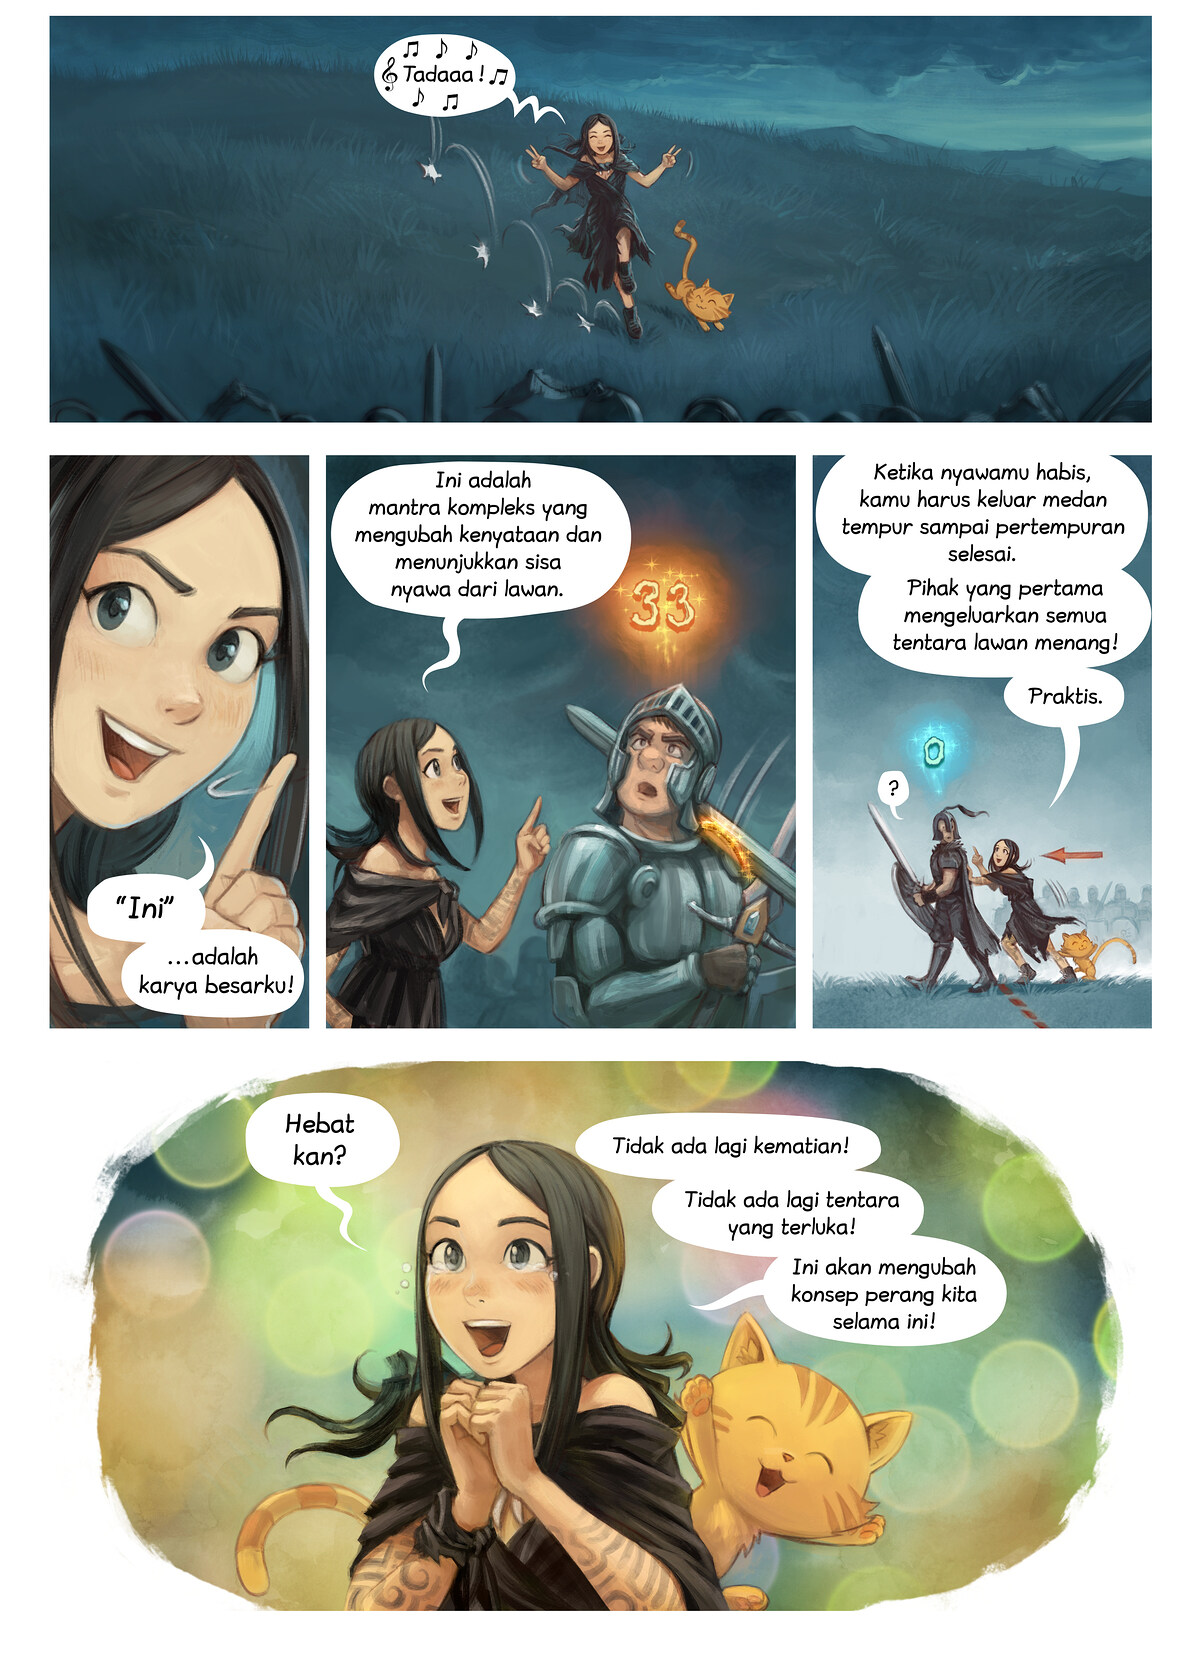 Episode 33: Mantra Perang, Page 7